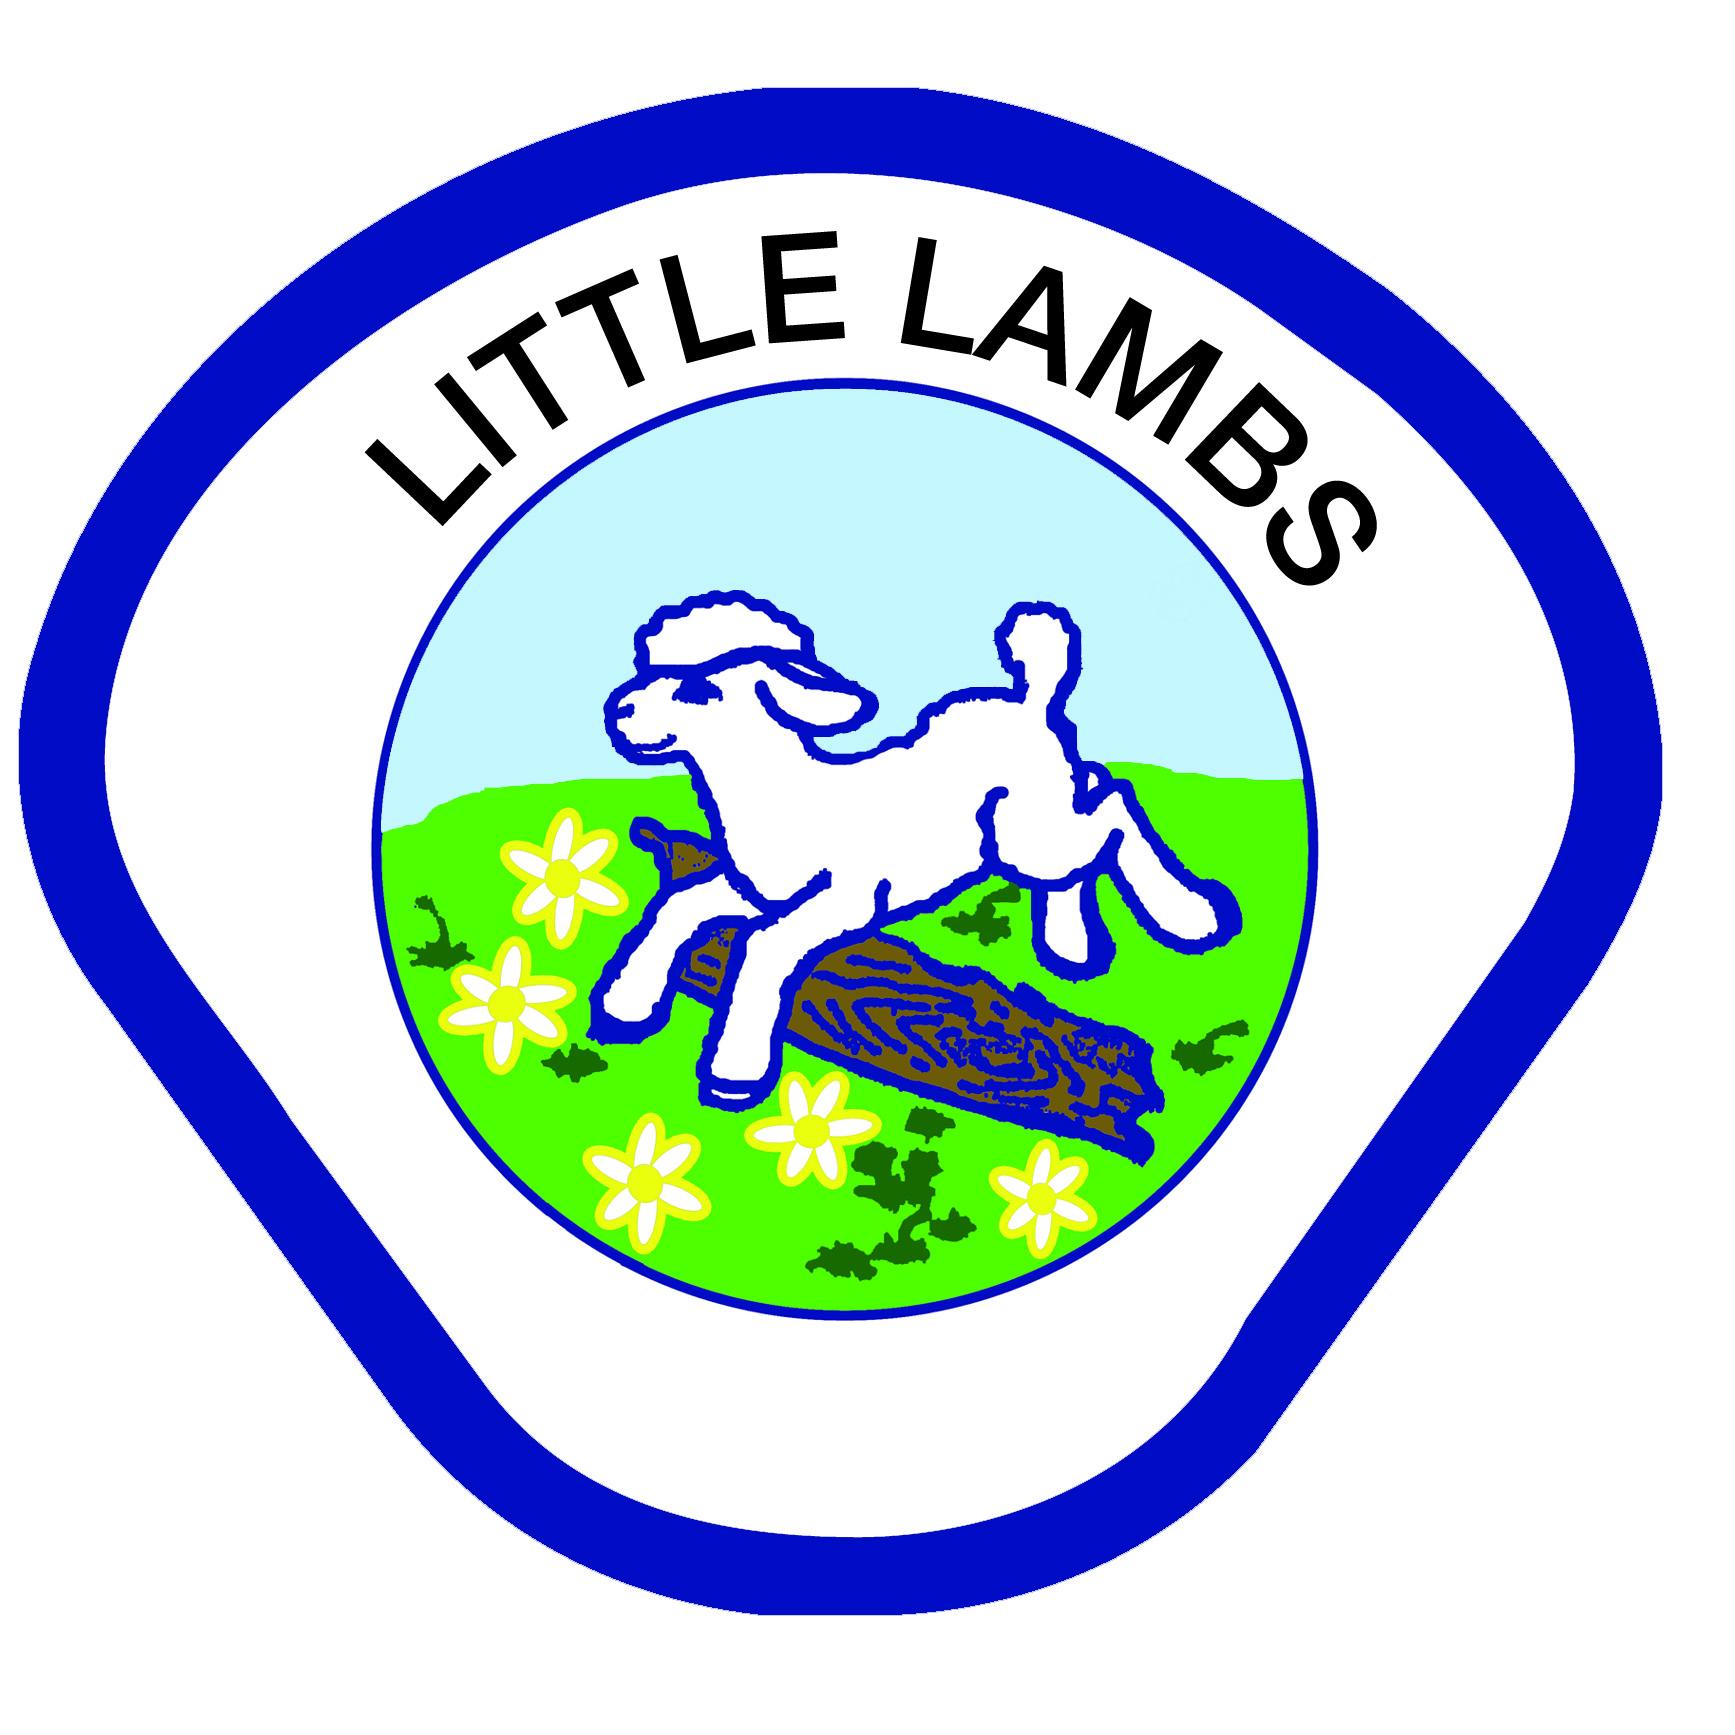 Adventurer Club Logos